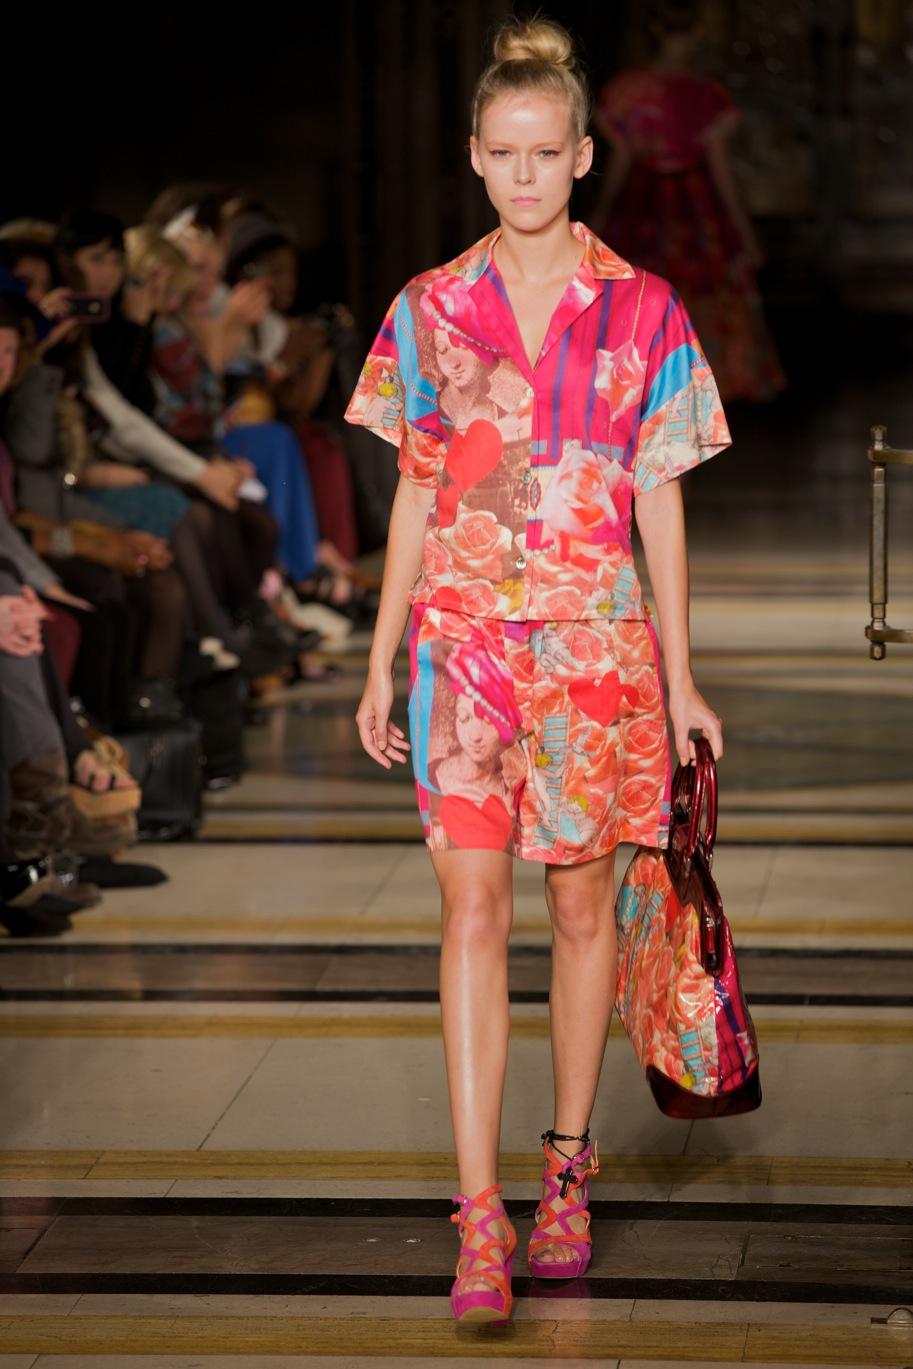 Fashion Scout Vestibule S-S 2012 © Marc Aitken 2014 . www.marcaitken.com 142011-09-182011.jpg